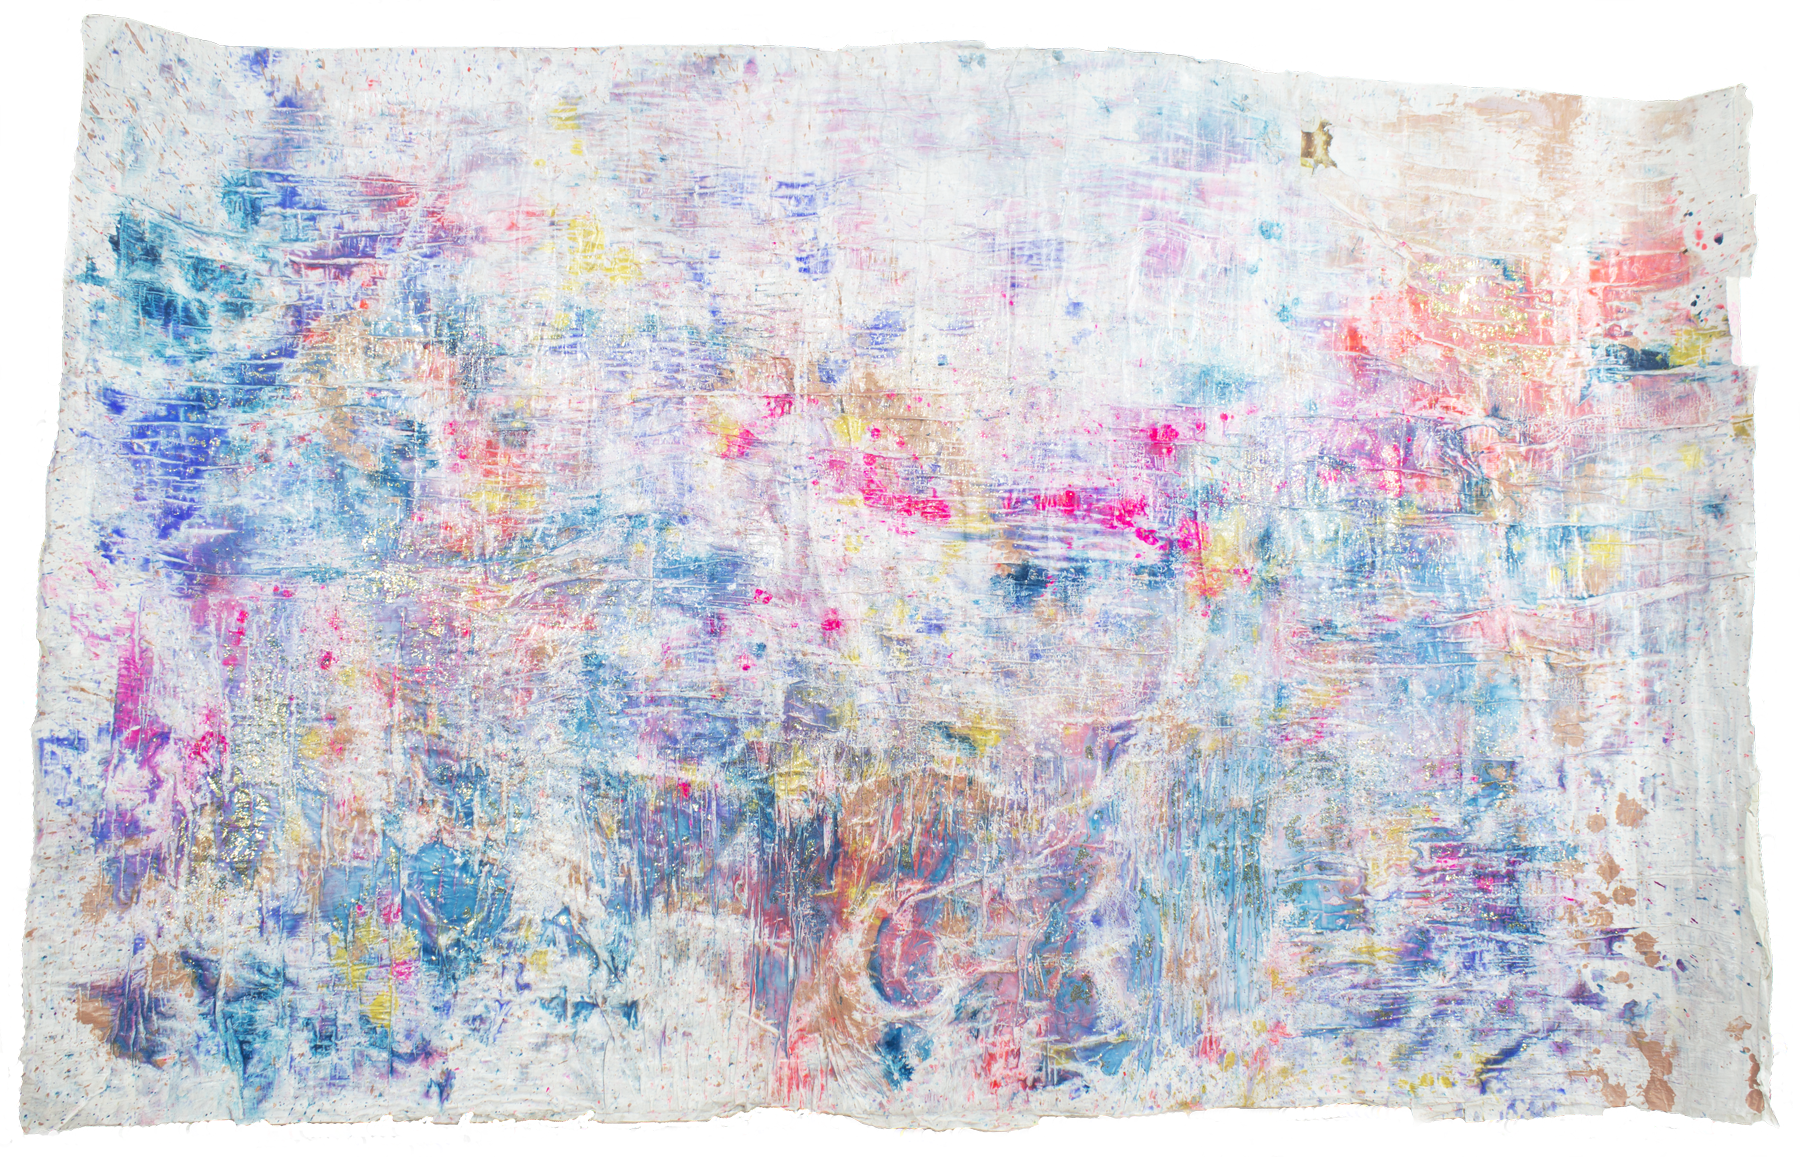 'Sparkling skies NO. 9',172 x 105 cm, acrylic paint on handmade paper-base, Kerstin Pressler, www.kerstinpressler.com